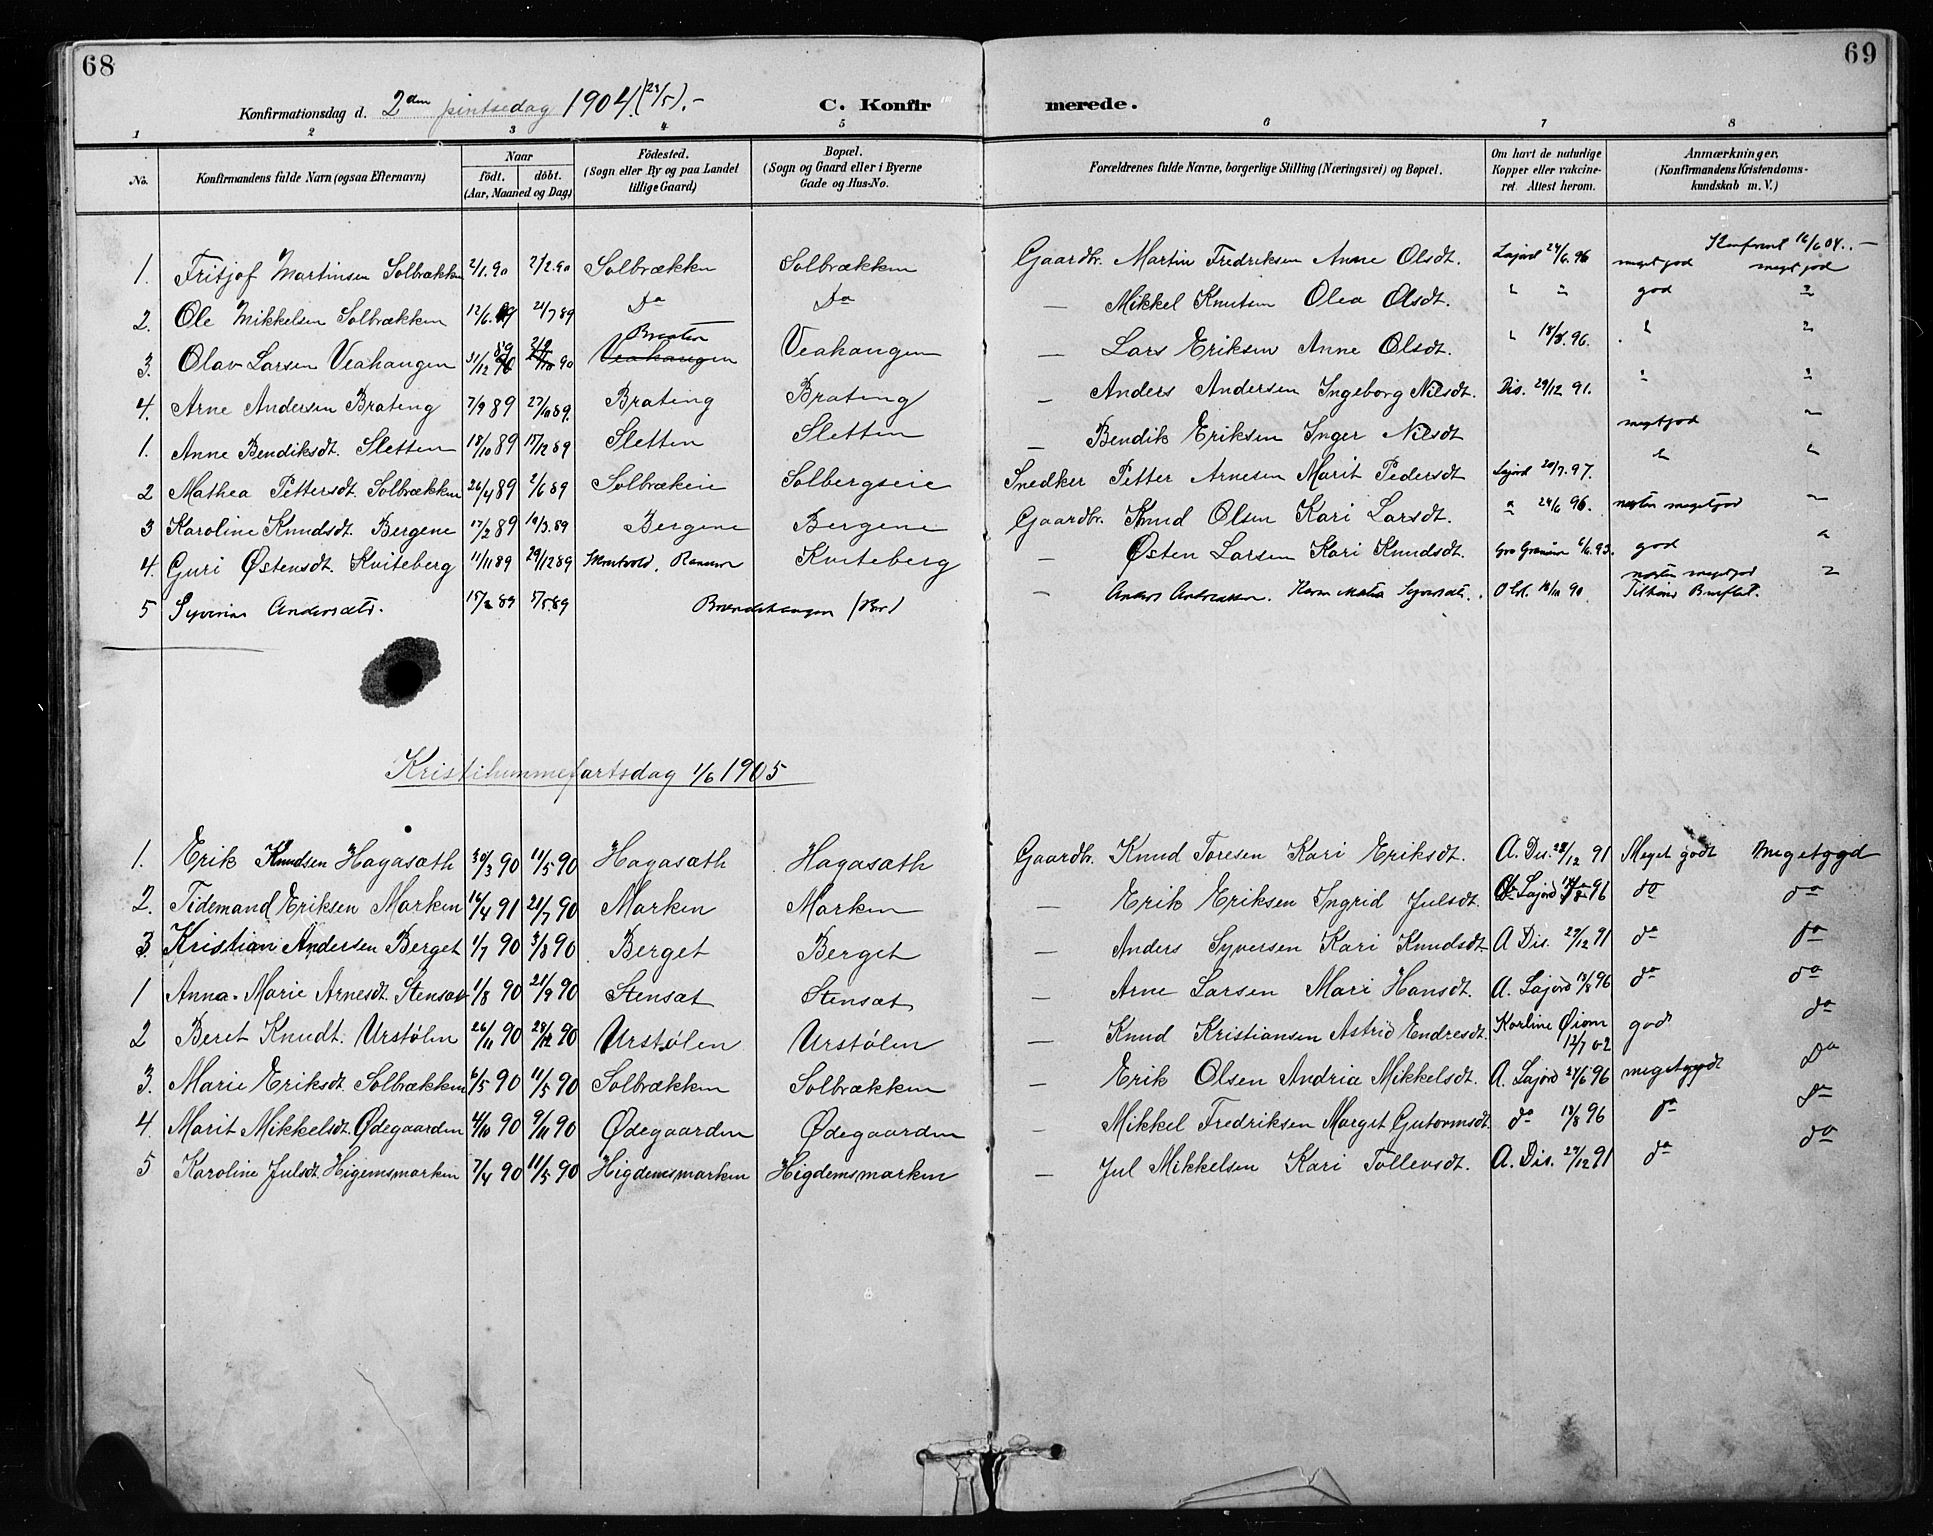 SAH, Etnedal prestekontor, H/Ha/Hab/Habb/L0001: Klokkerbok nr. II 1, 1894-1911, s. 68-69